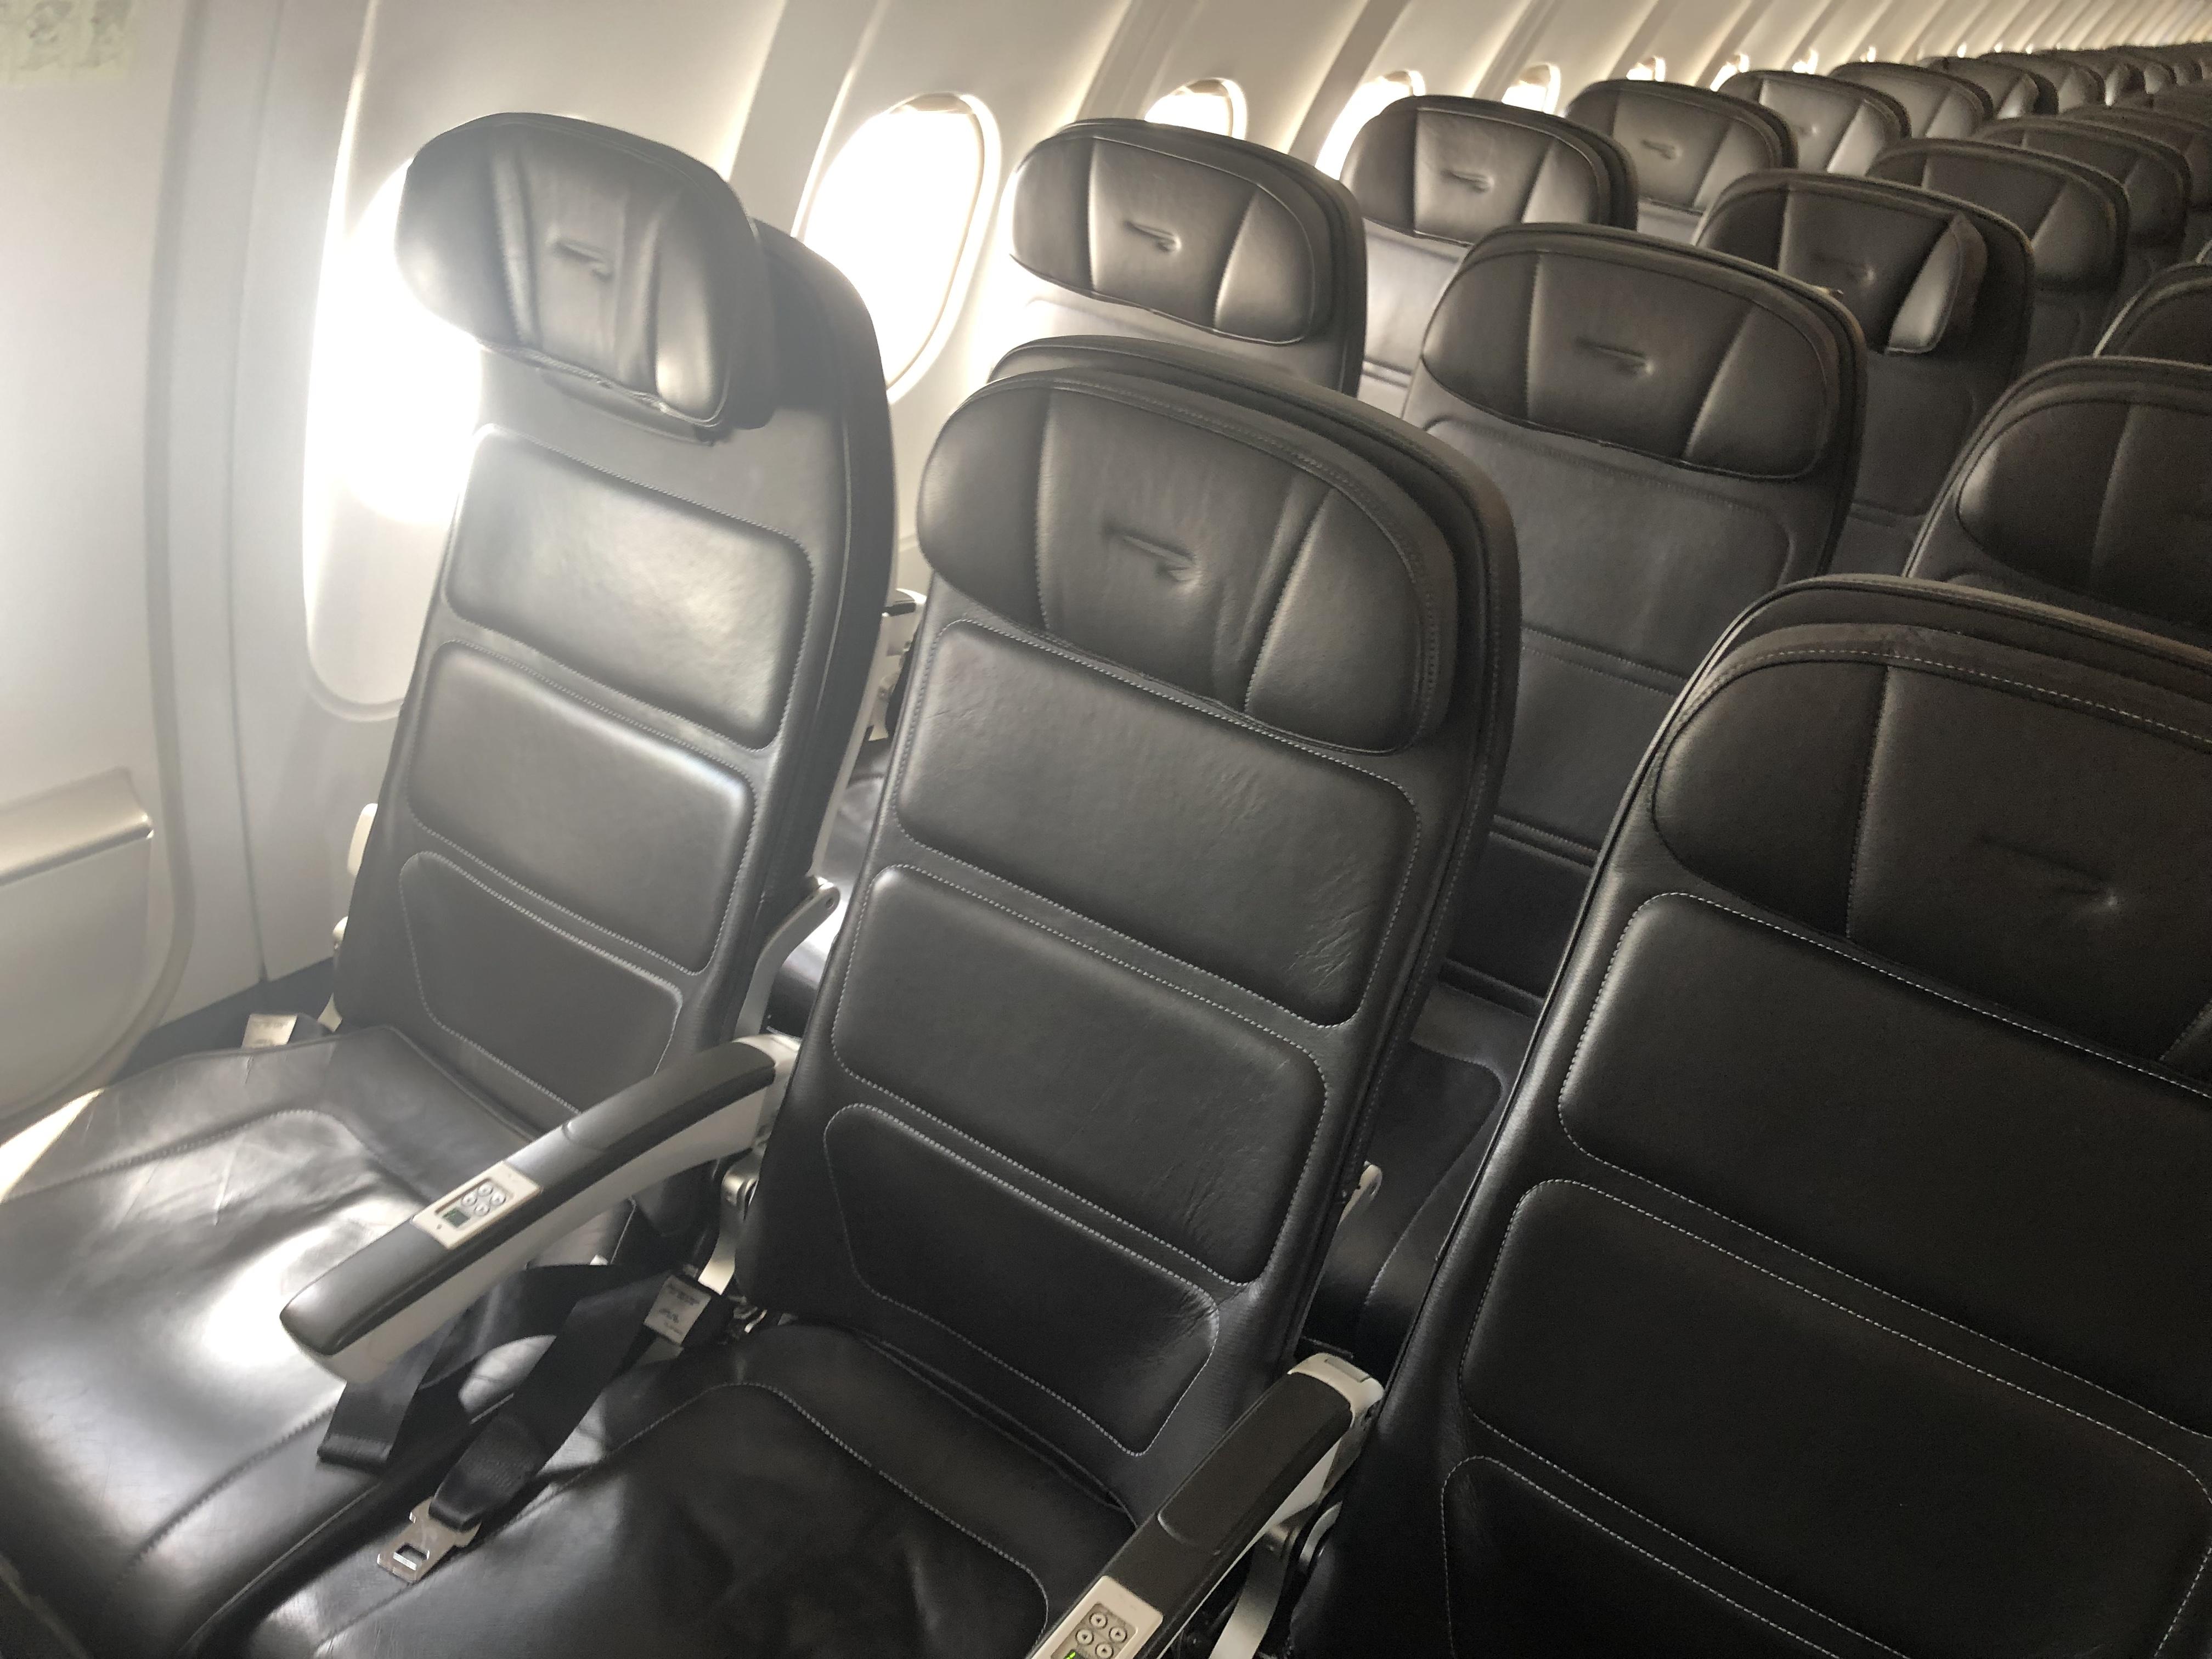 British Airways Customer Reviews | SKYTRAX